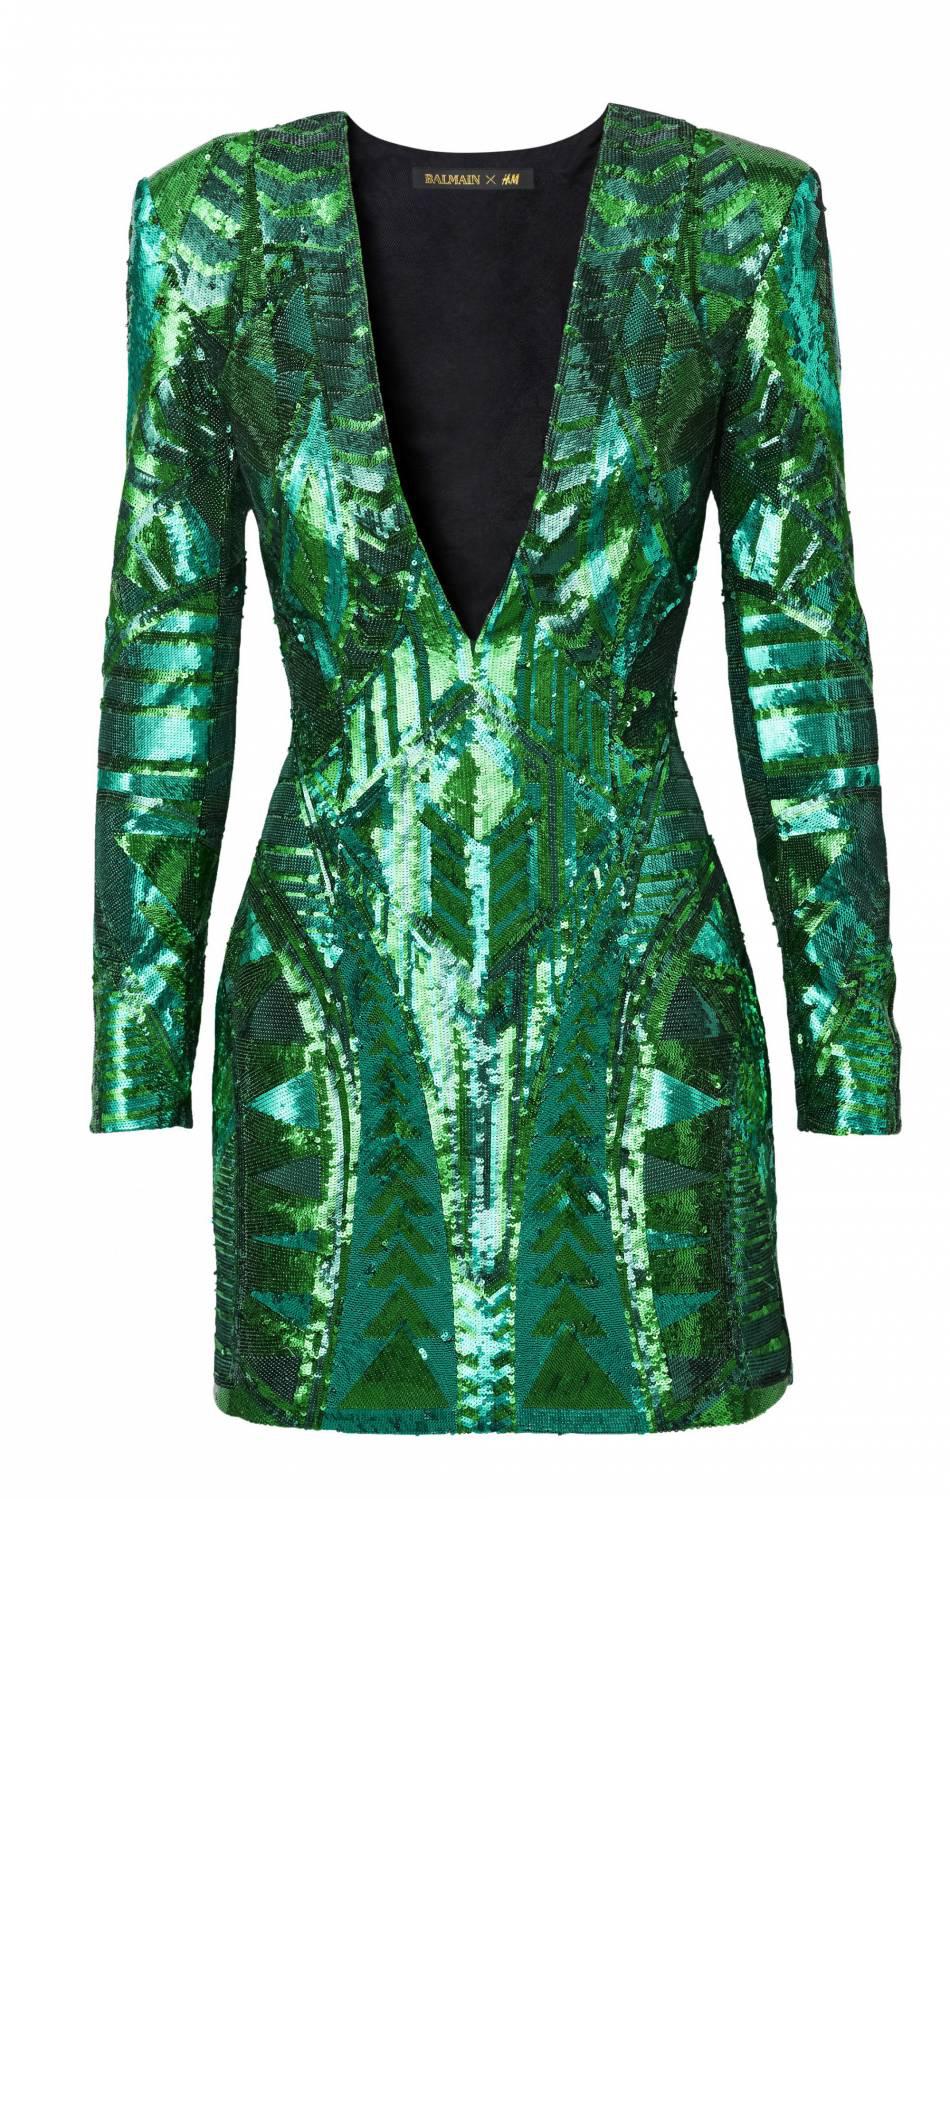 Balmain x H&M - robe